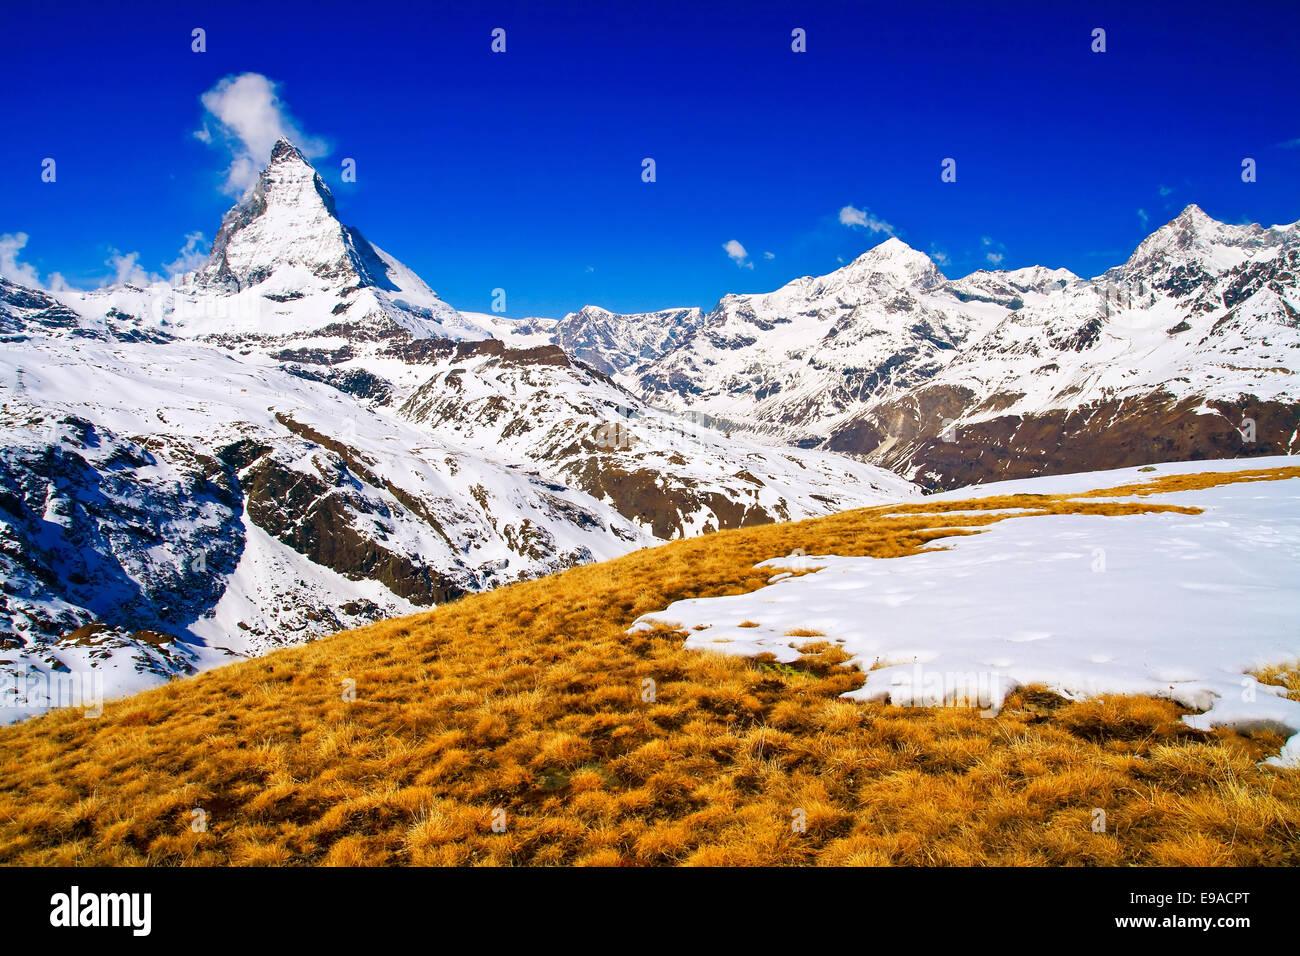 Matterhorn peak Alp Switzerland - Stock Image